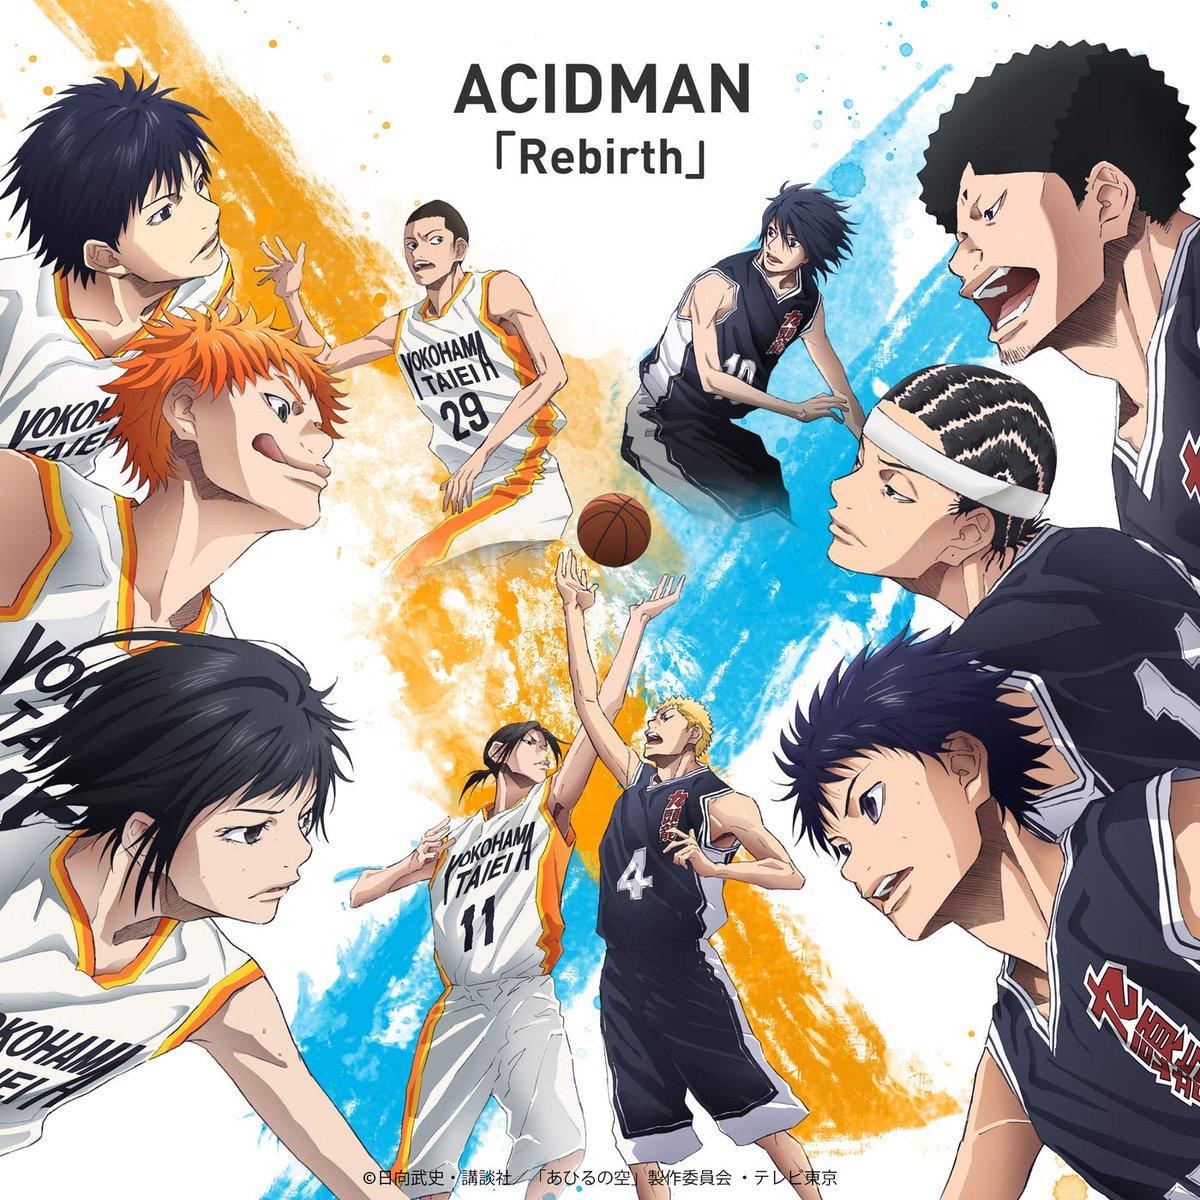 ACIDMAN - Rebirth Lyrics